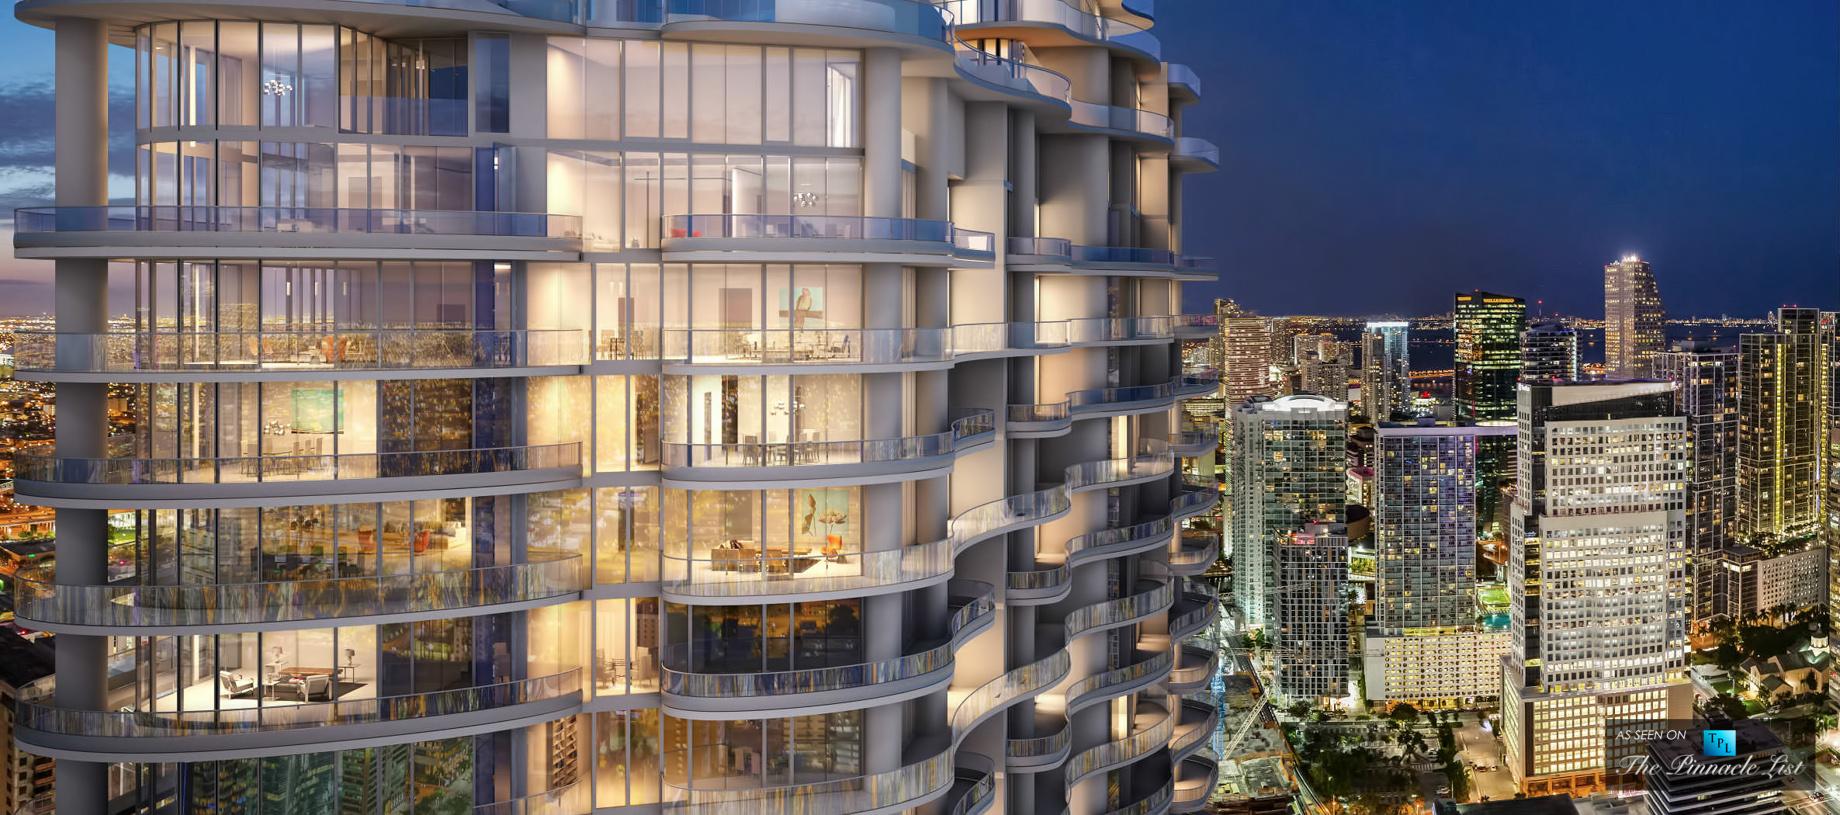 Brickell Flatiron Luxury Condos - 1001 S Miami Ave, Miami, FL, USA